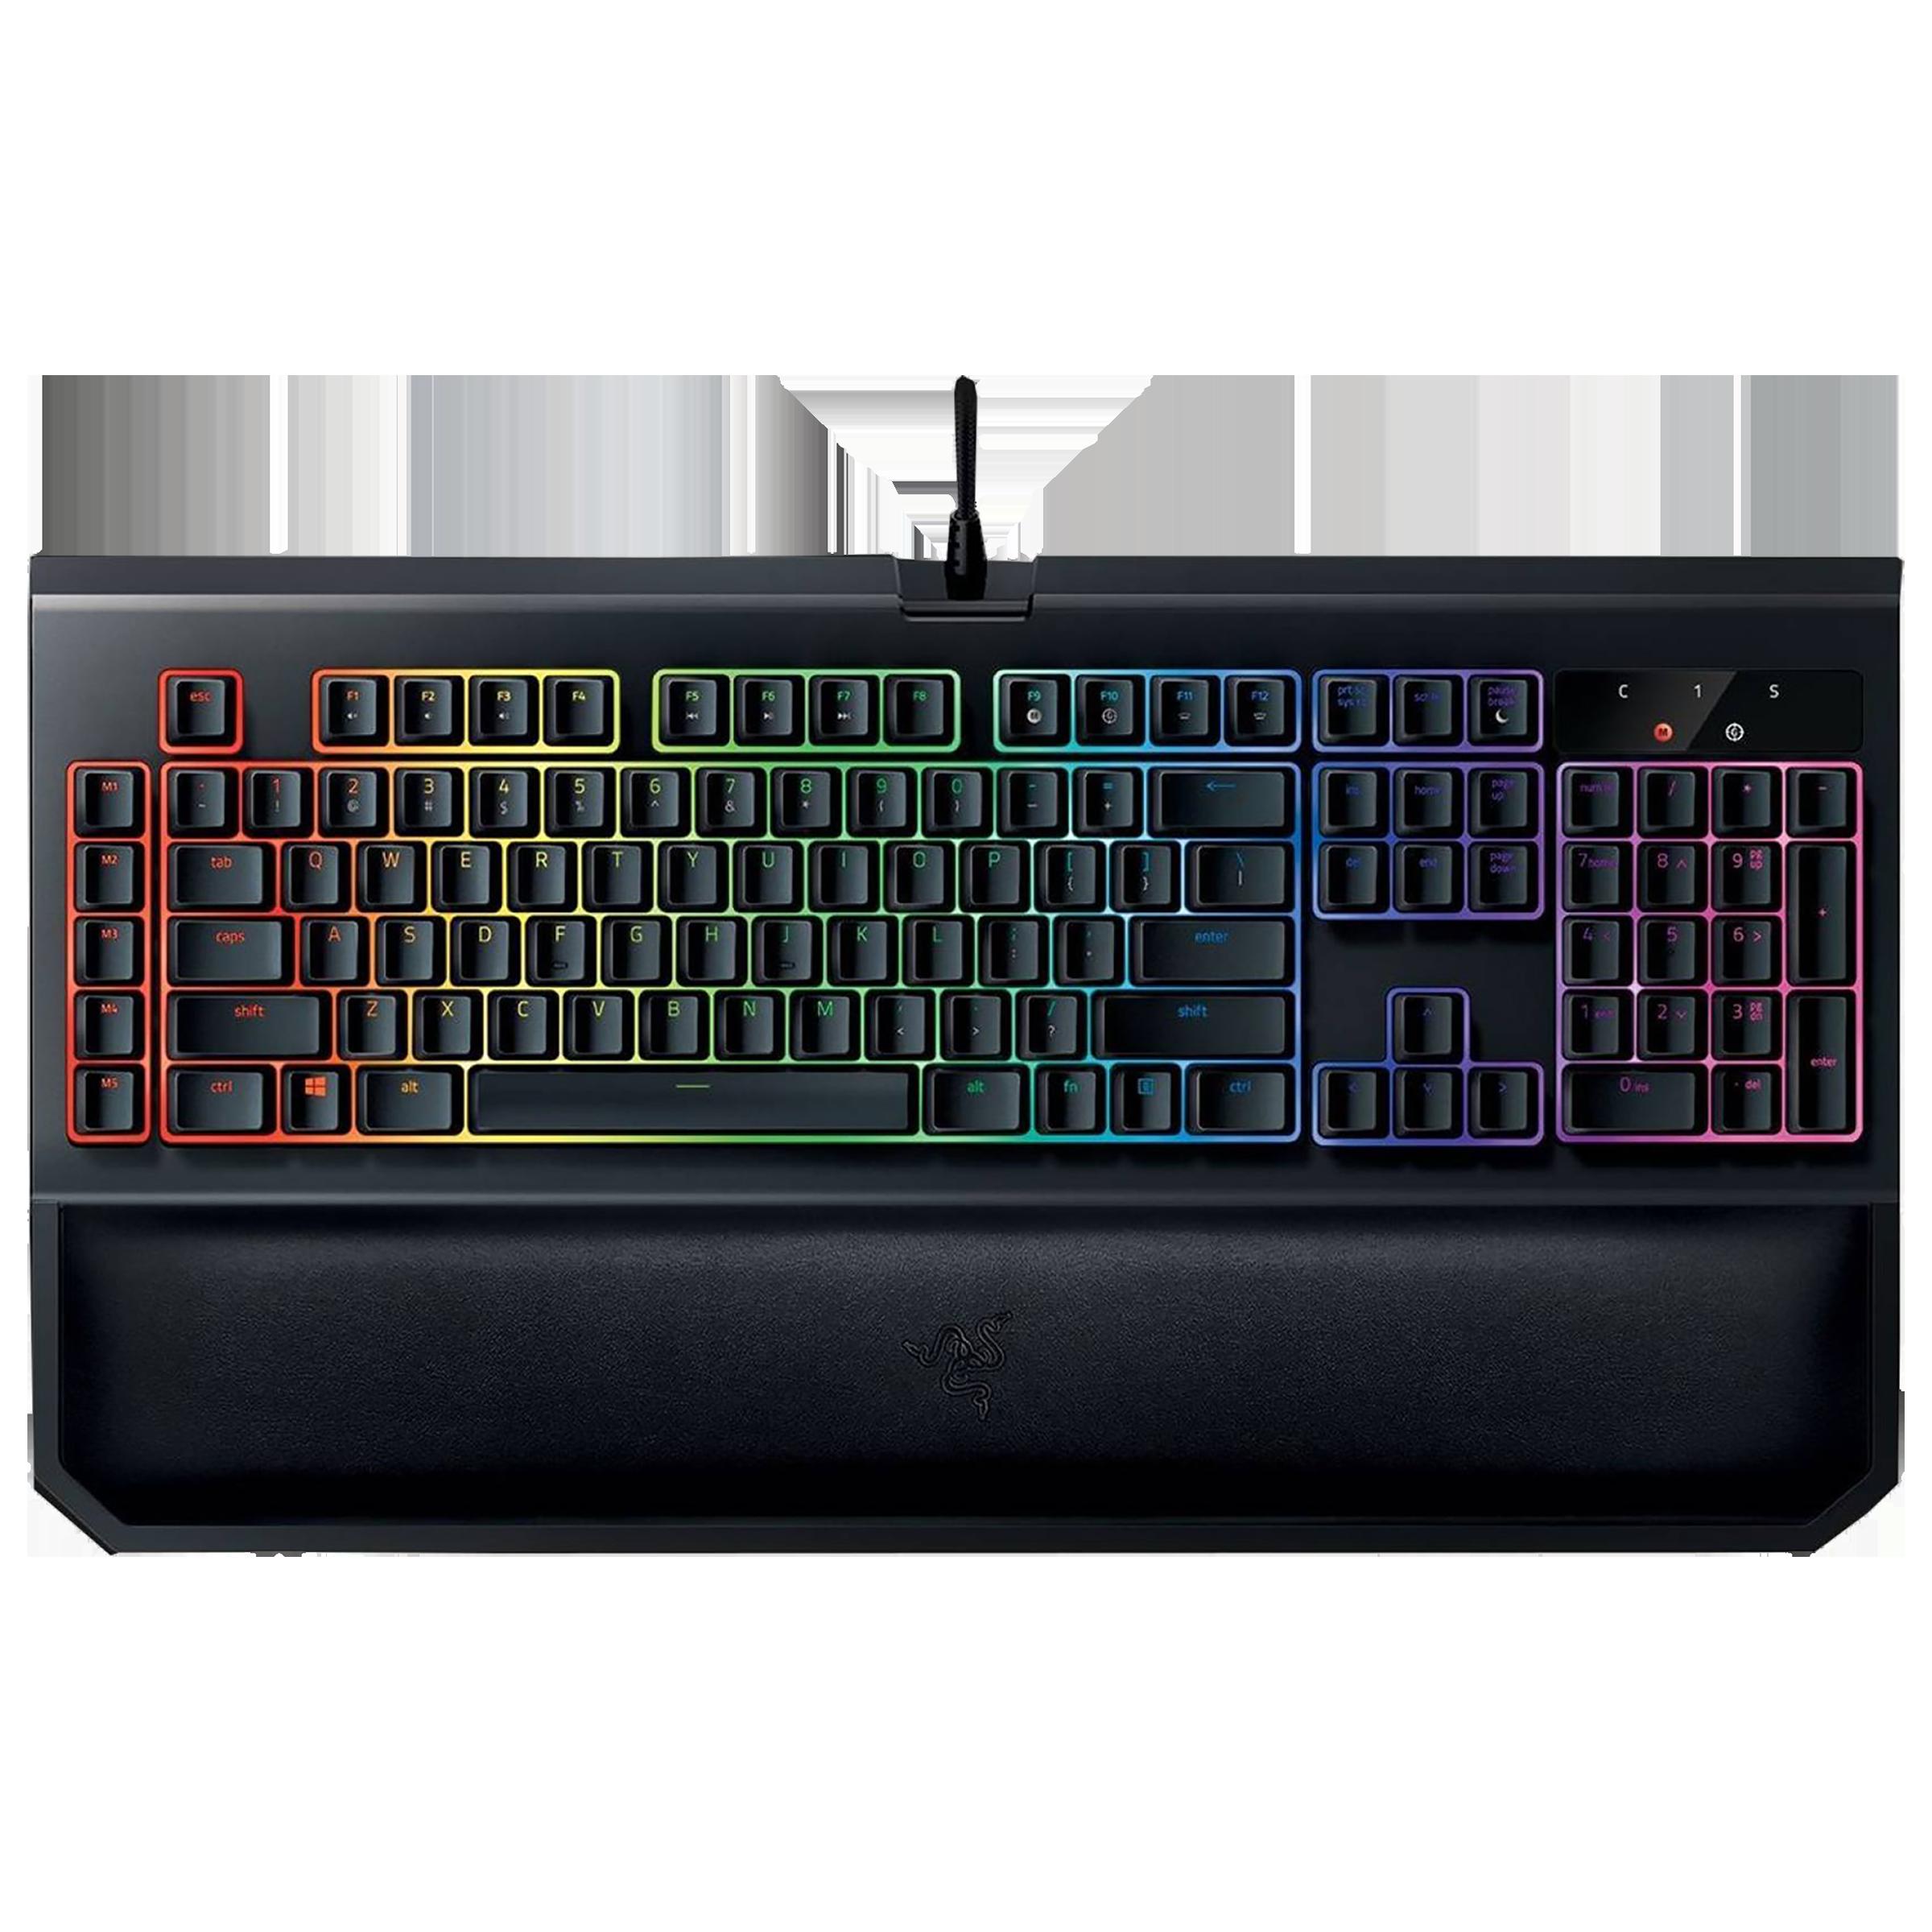 Razer BlackWidow Tournament Edition Chroma V2 Wired Gaming Keyboard (Green Mechanical Switch, RZ03-02190100-R3M1, Black)_1